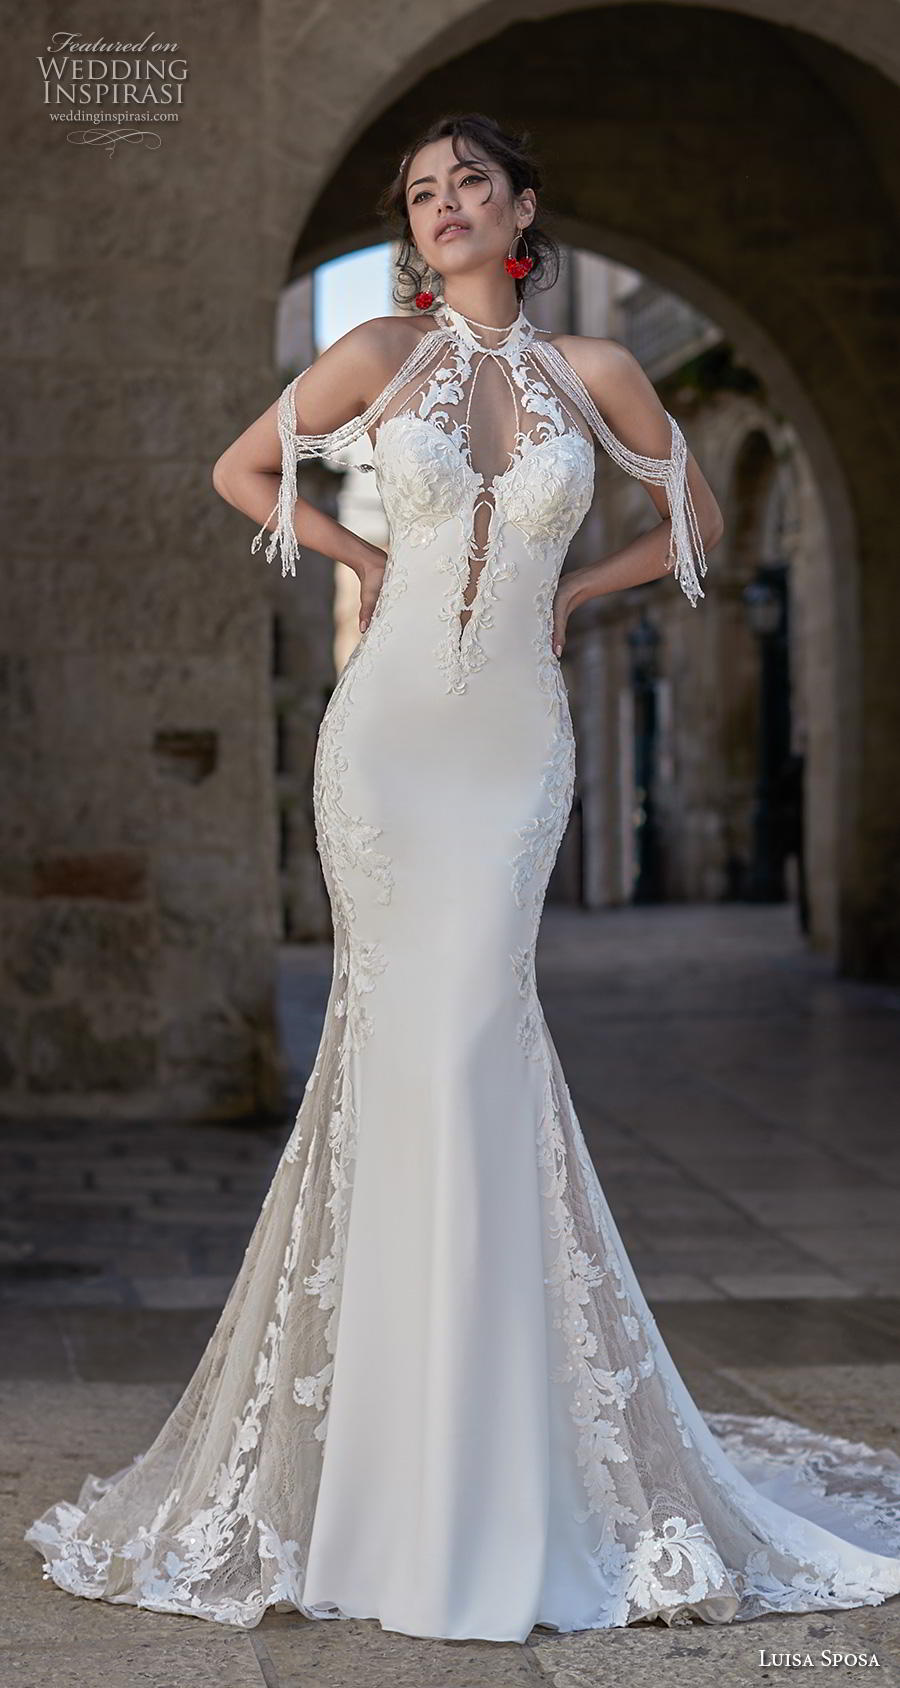 luisa sposa 2020 bridal cold shoulder sweetheart neckline light embellishment elegant glamorous fit and flare wedding dress backless low back chapel train (11) mv